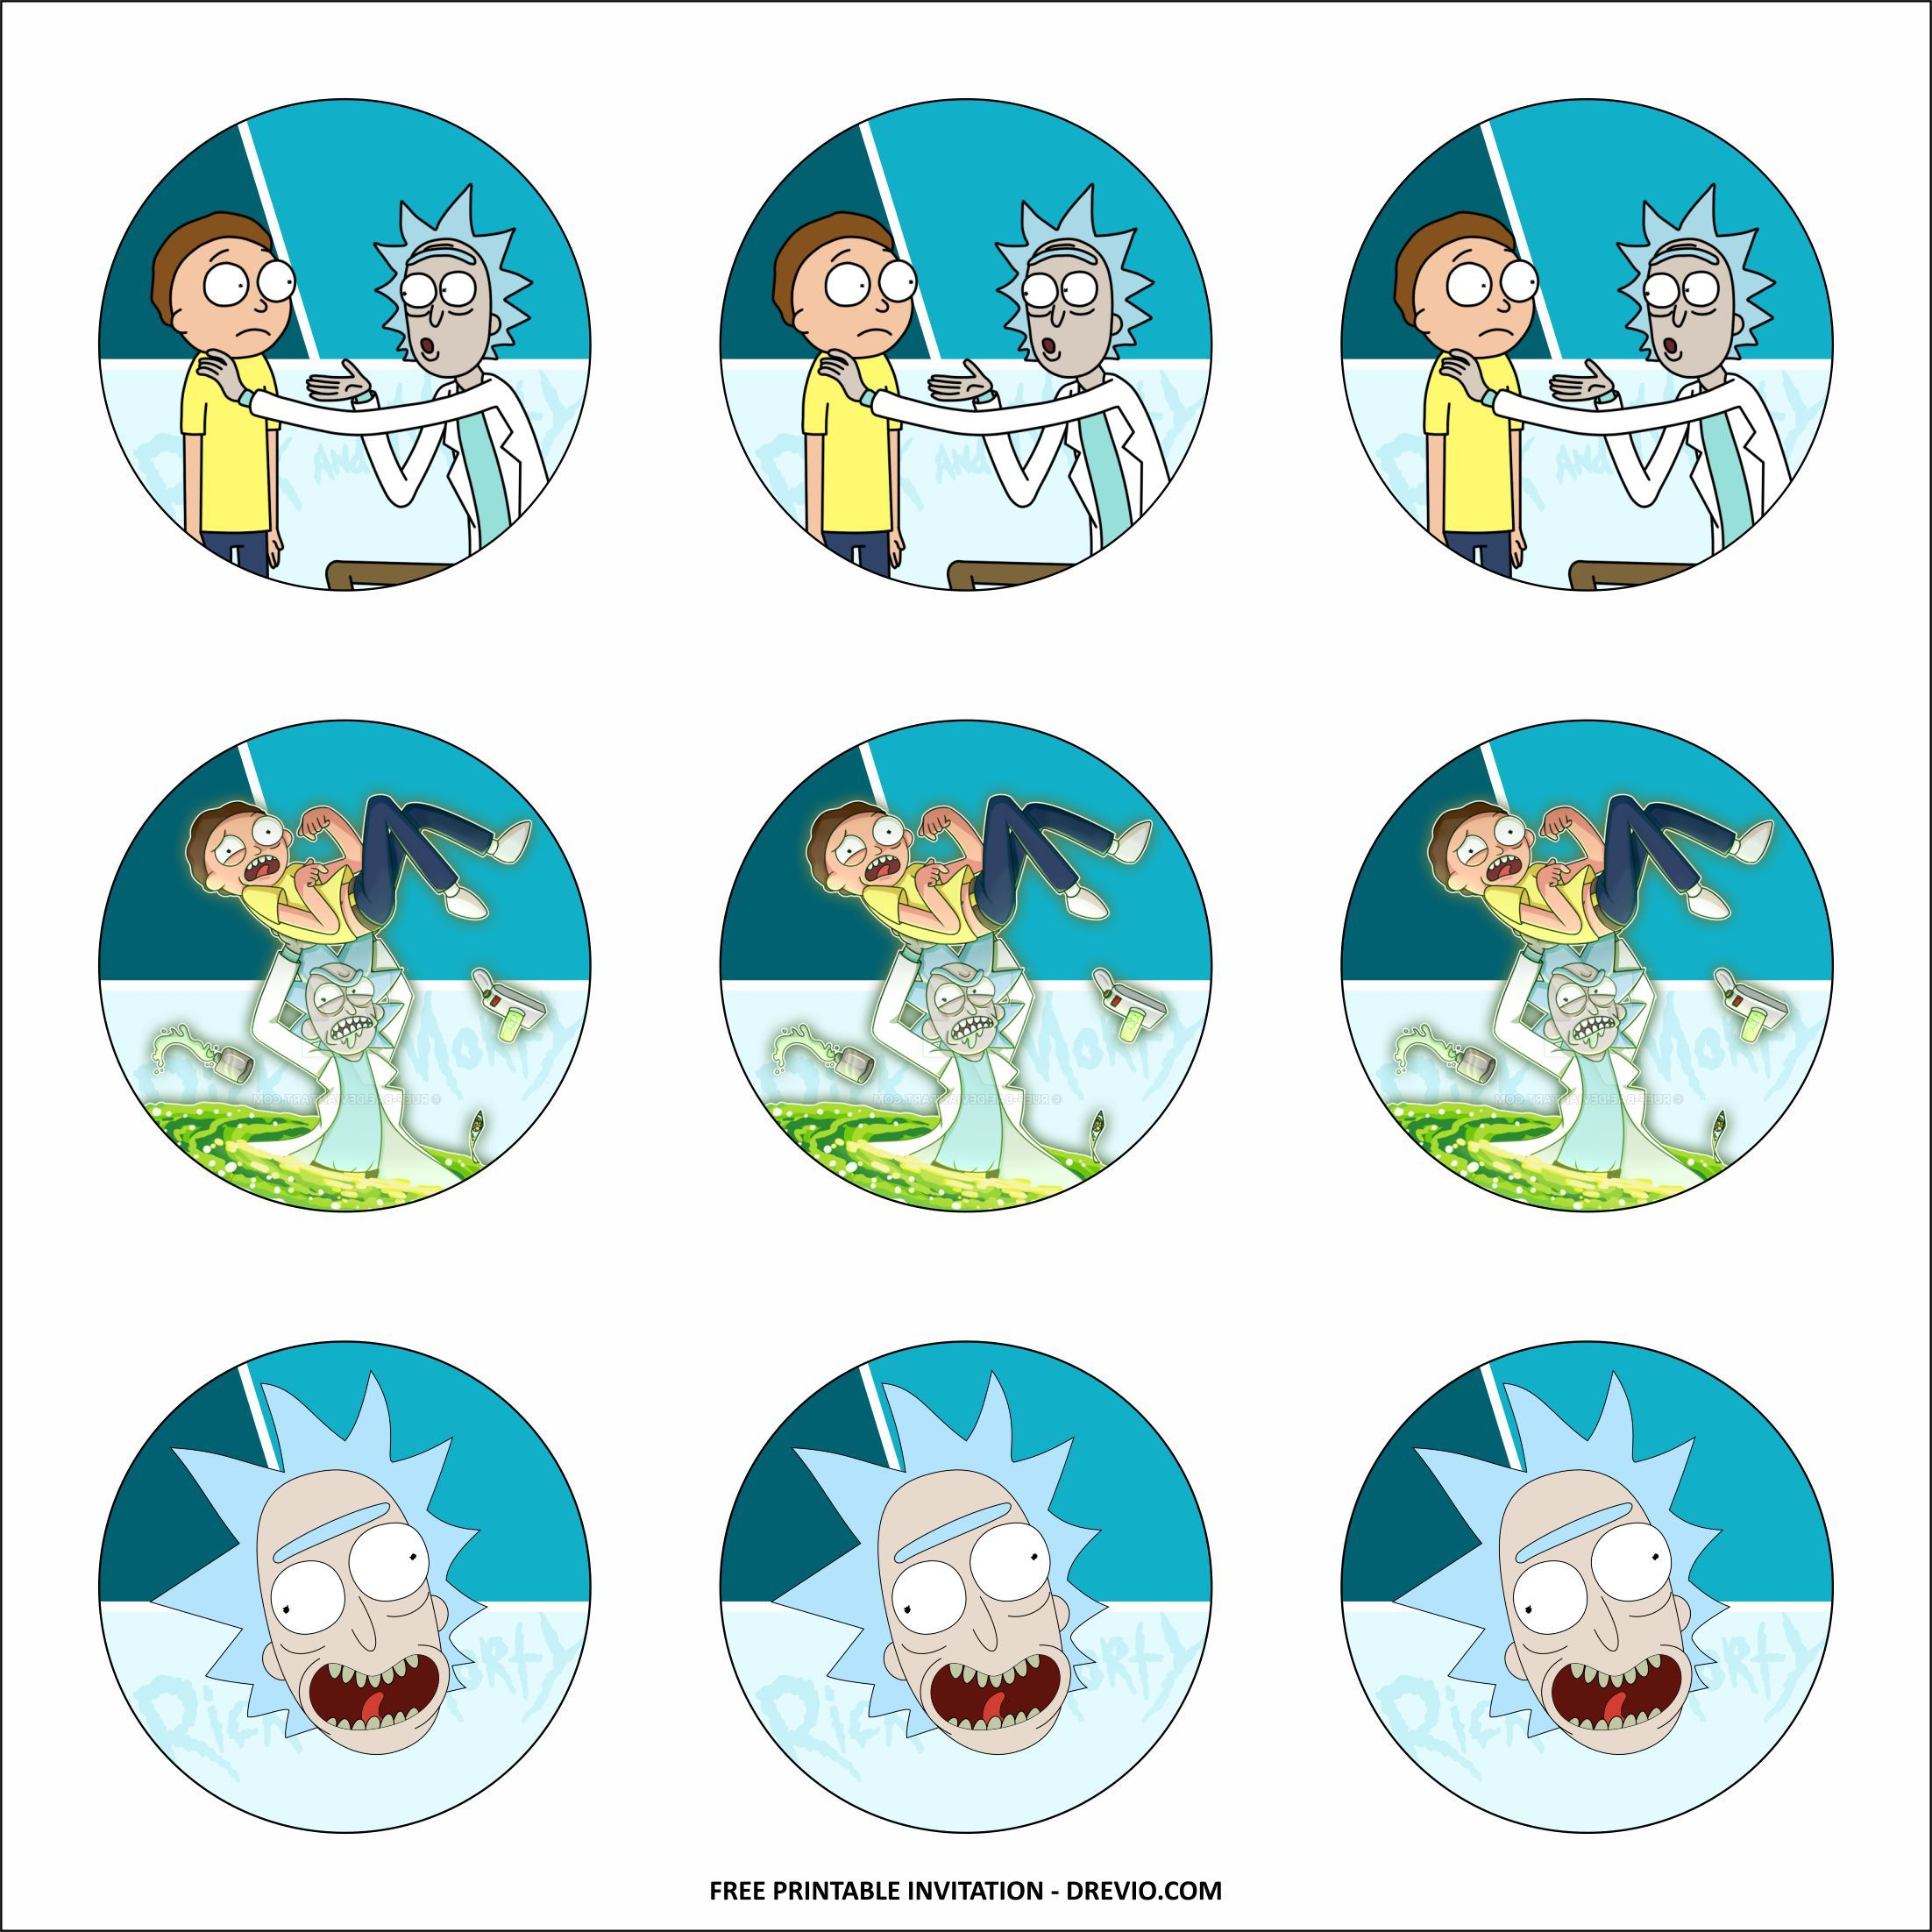 Free Printable Rick And Morty Birthday Party Kits Templates Free And Inspiring Party Kits Birthday Party Kits Free Printable Birthday Invitations